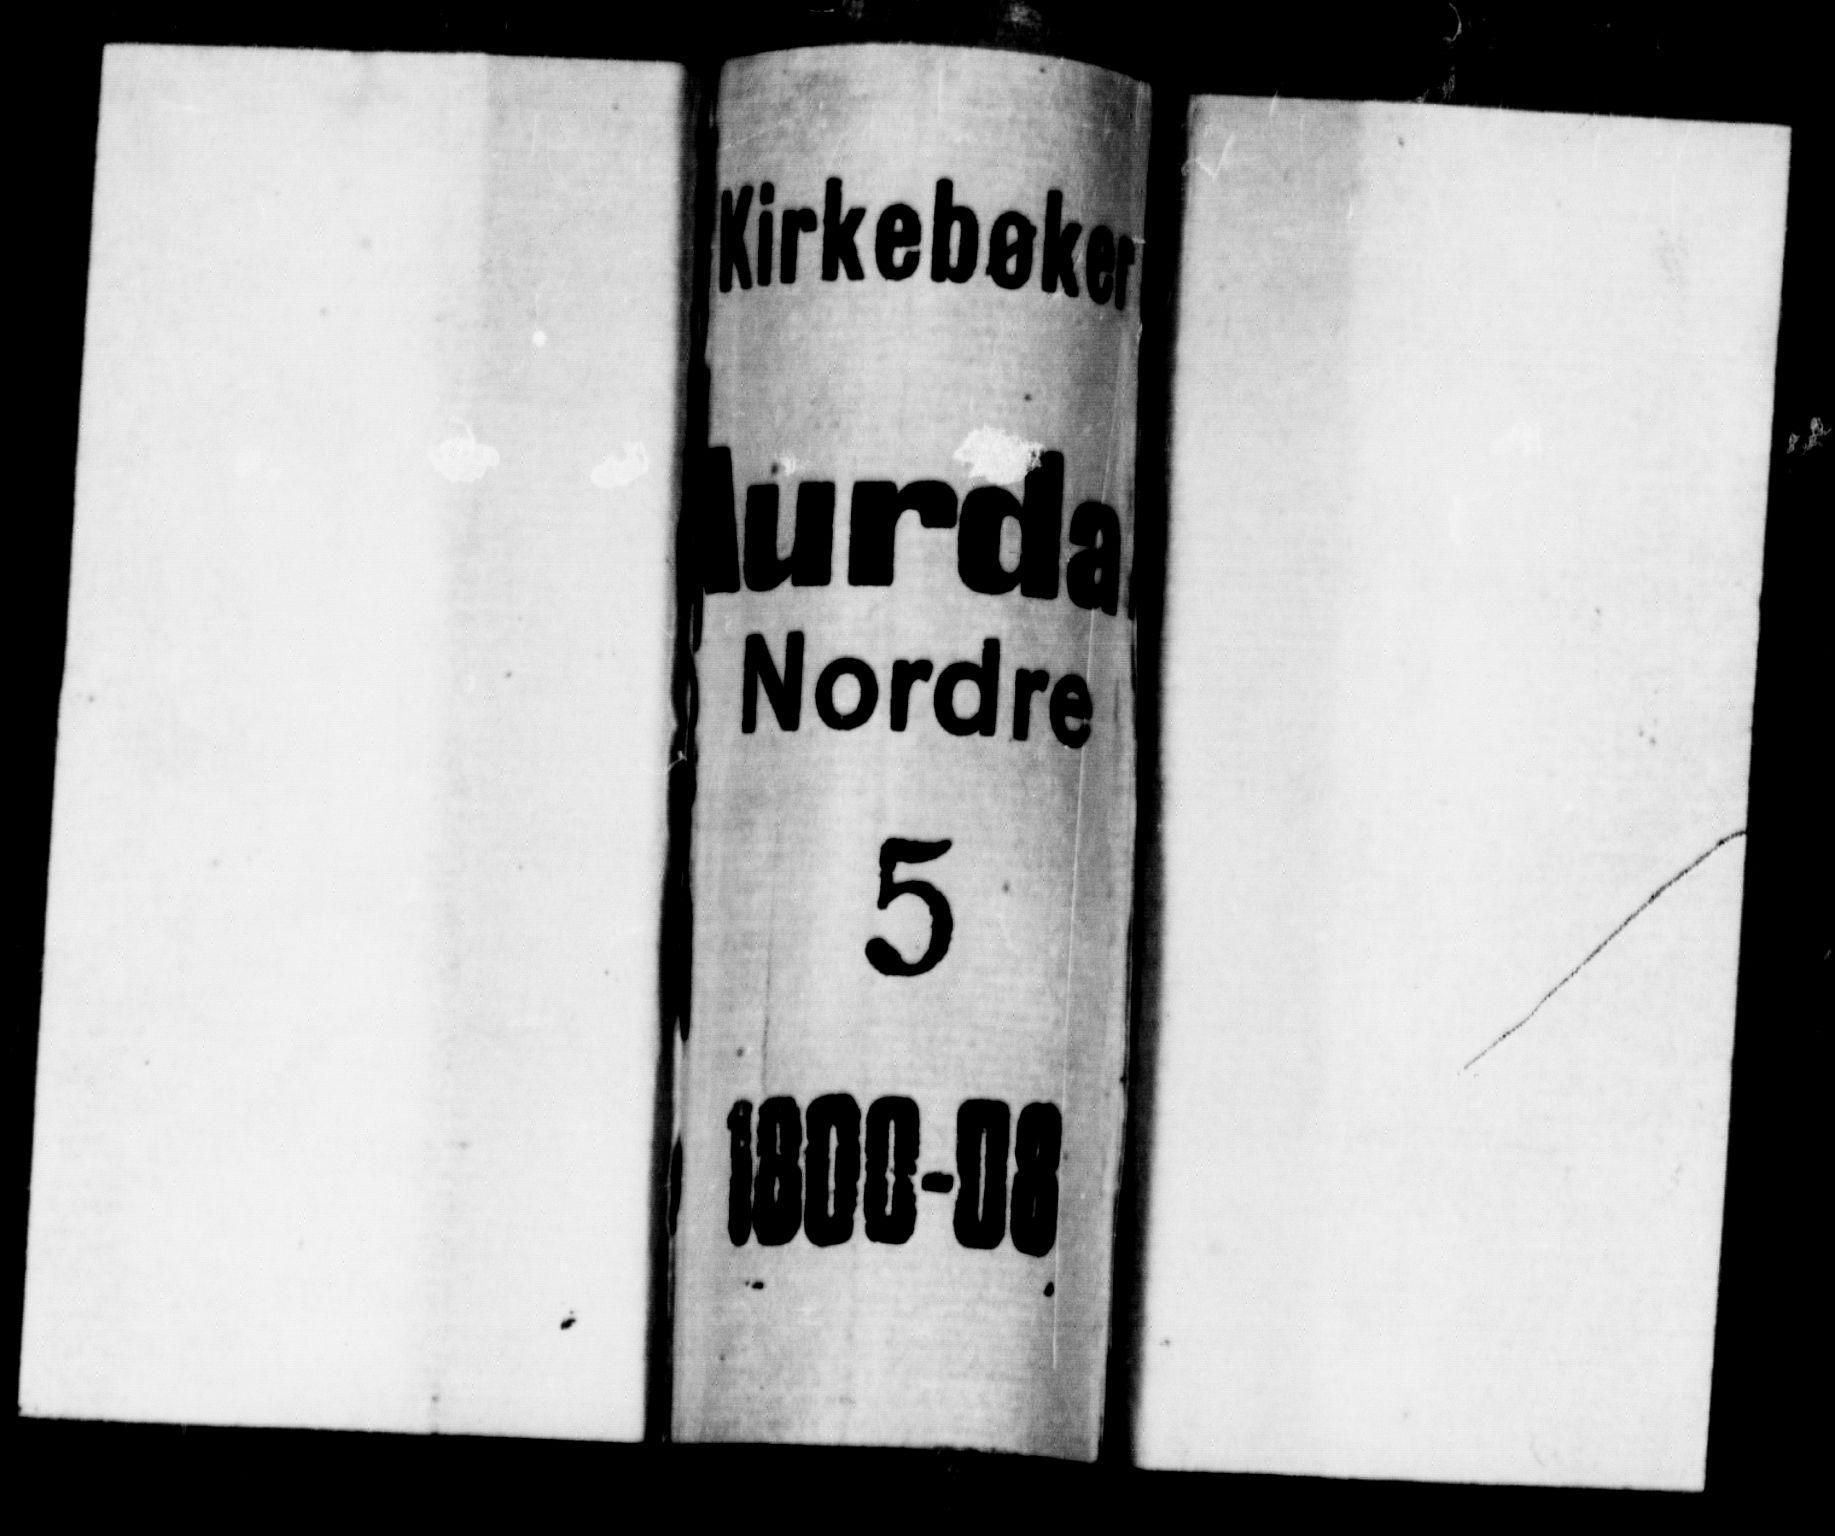 SAH, Aurdal prestekontor, Ministerialbok nr. 7, 1800-1808